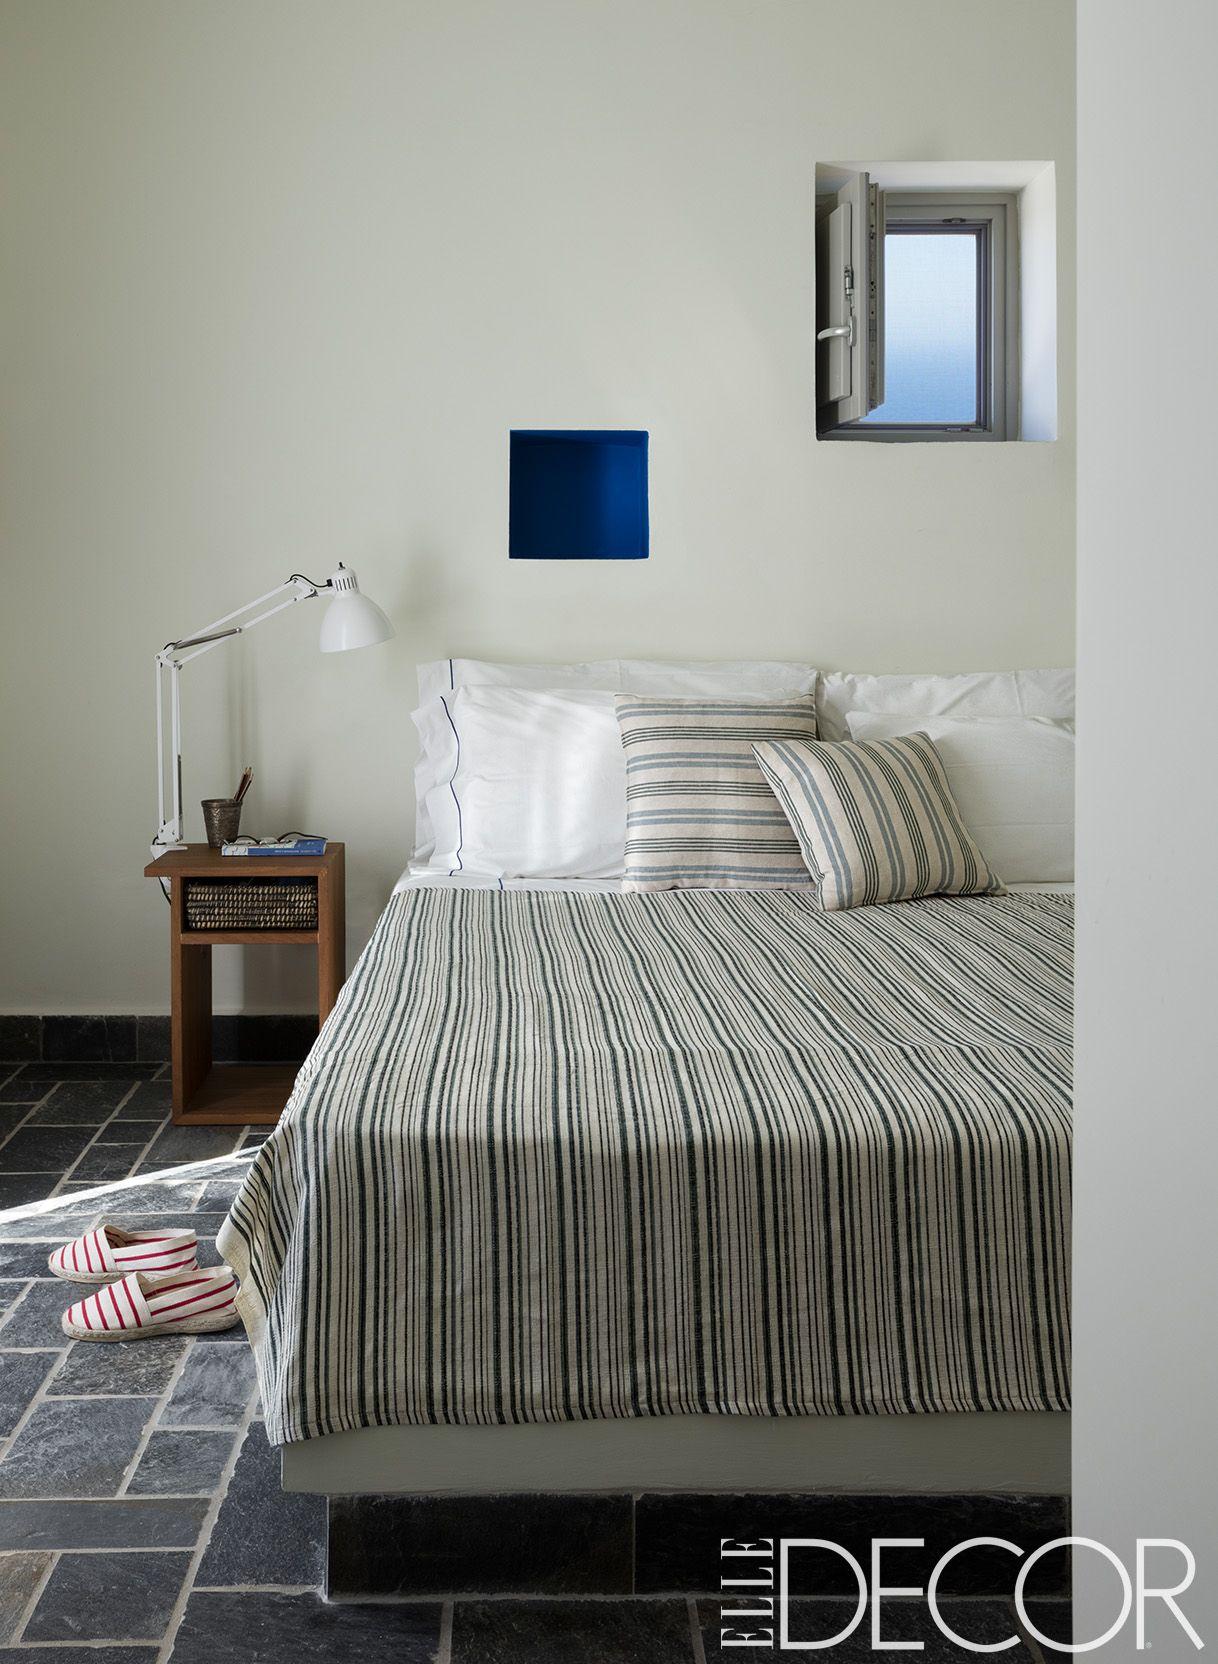 25 Minimalist Bedroom Decor Ideas - Modern Designs for ... on Minimalist Modern Simple Bedroom Design  id=49252